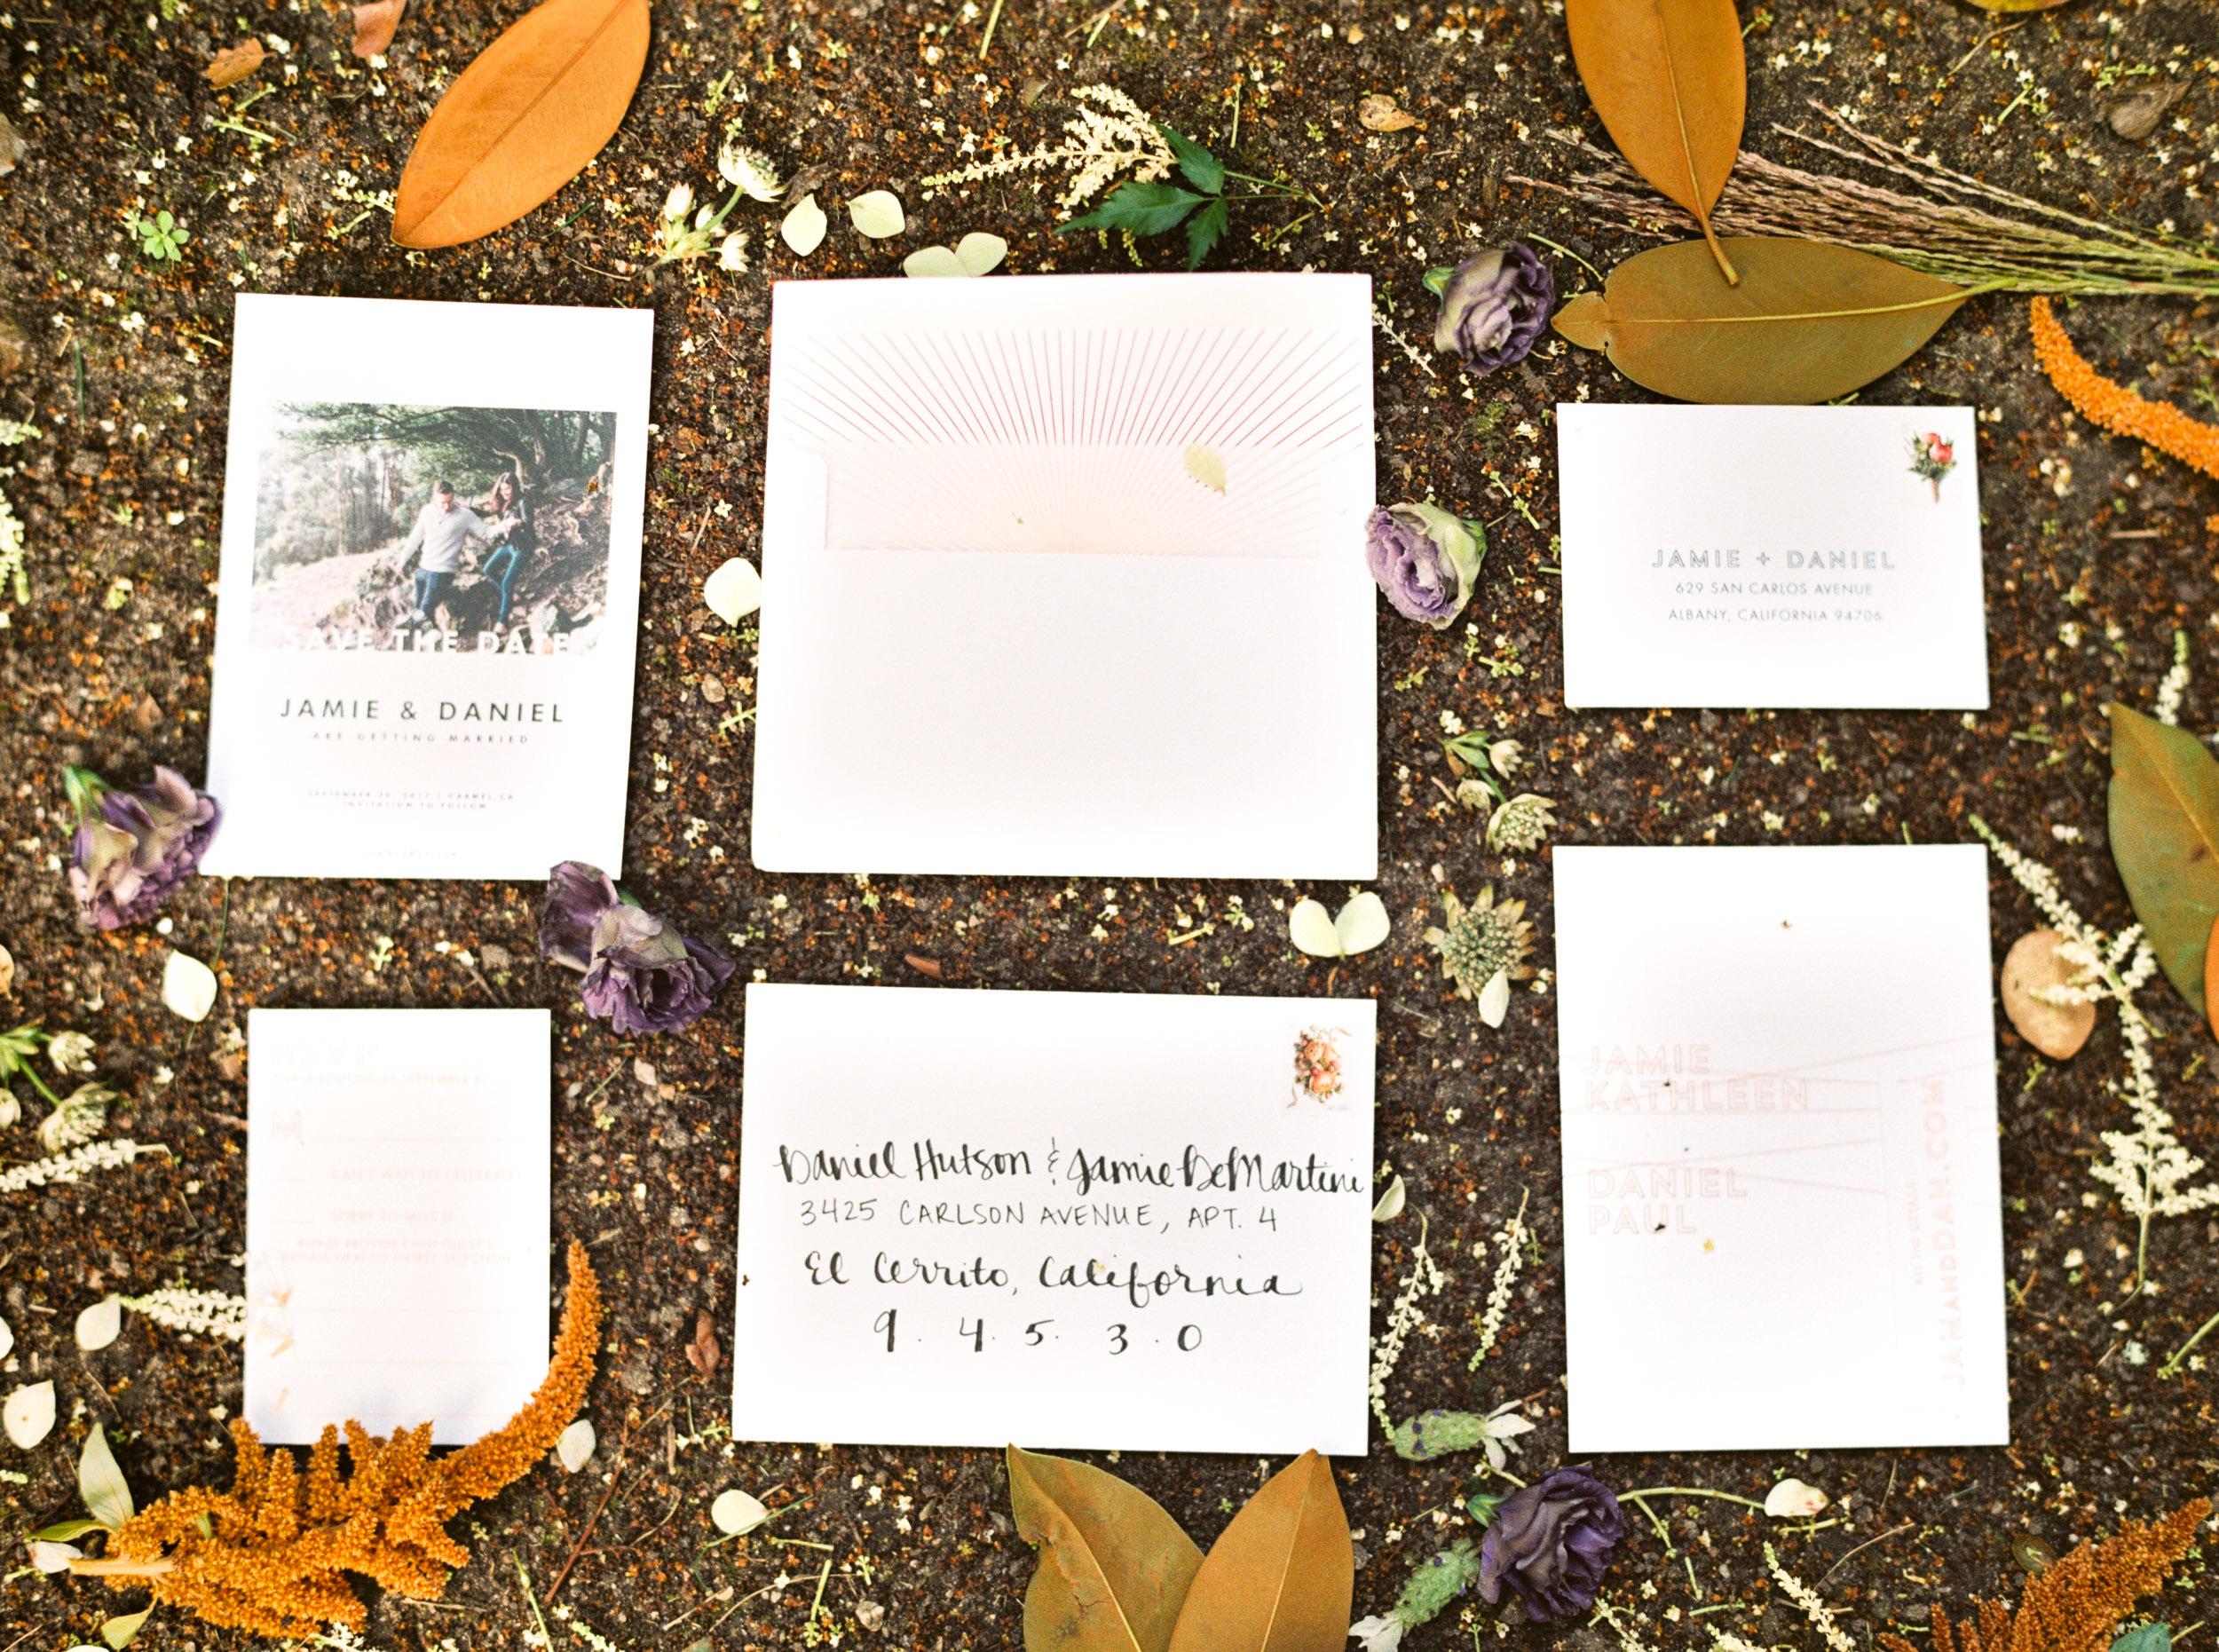 WEDDING-INVITATION-PHOTOGRAPHER-CARMEL-CALIFORNIA.jpg